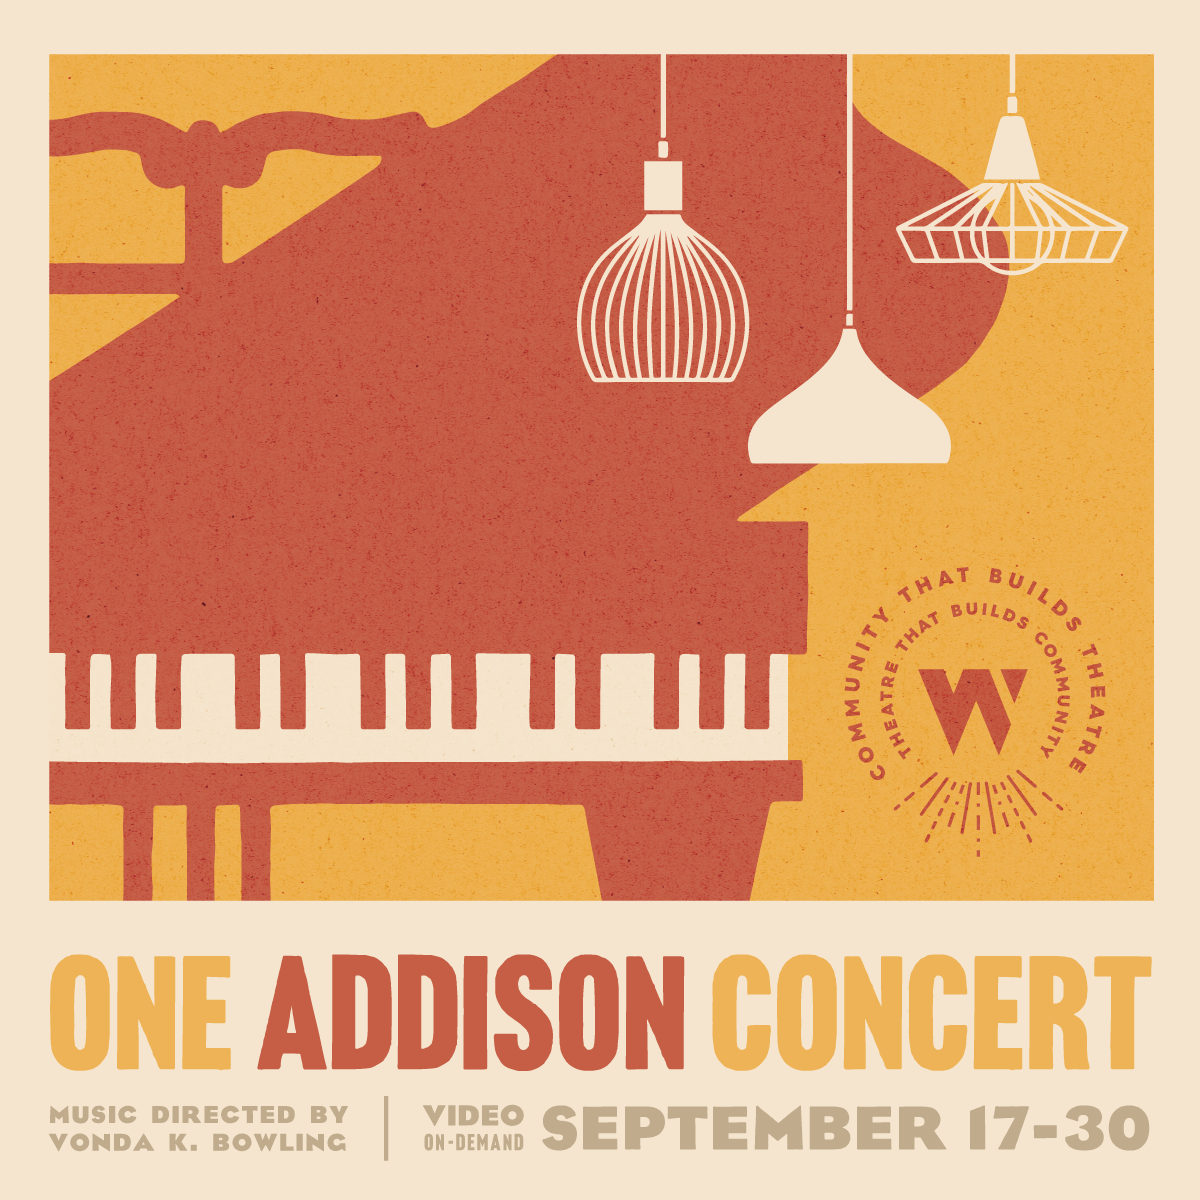 WaterTower Theatre, ONE Addison